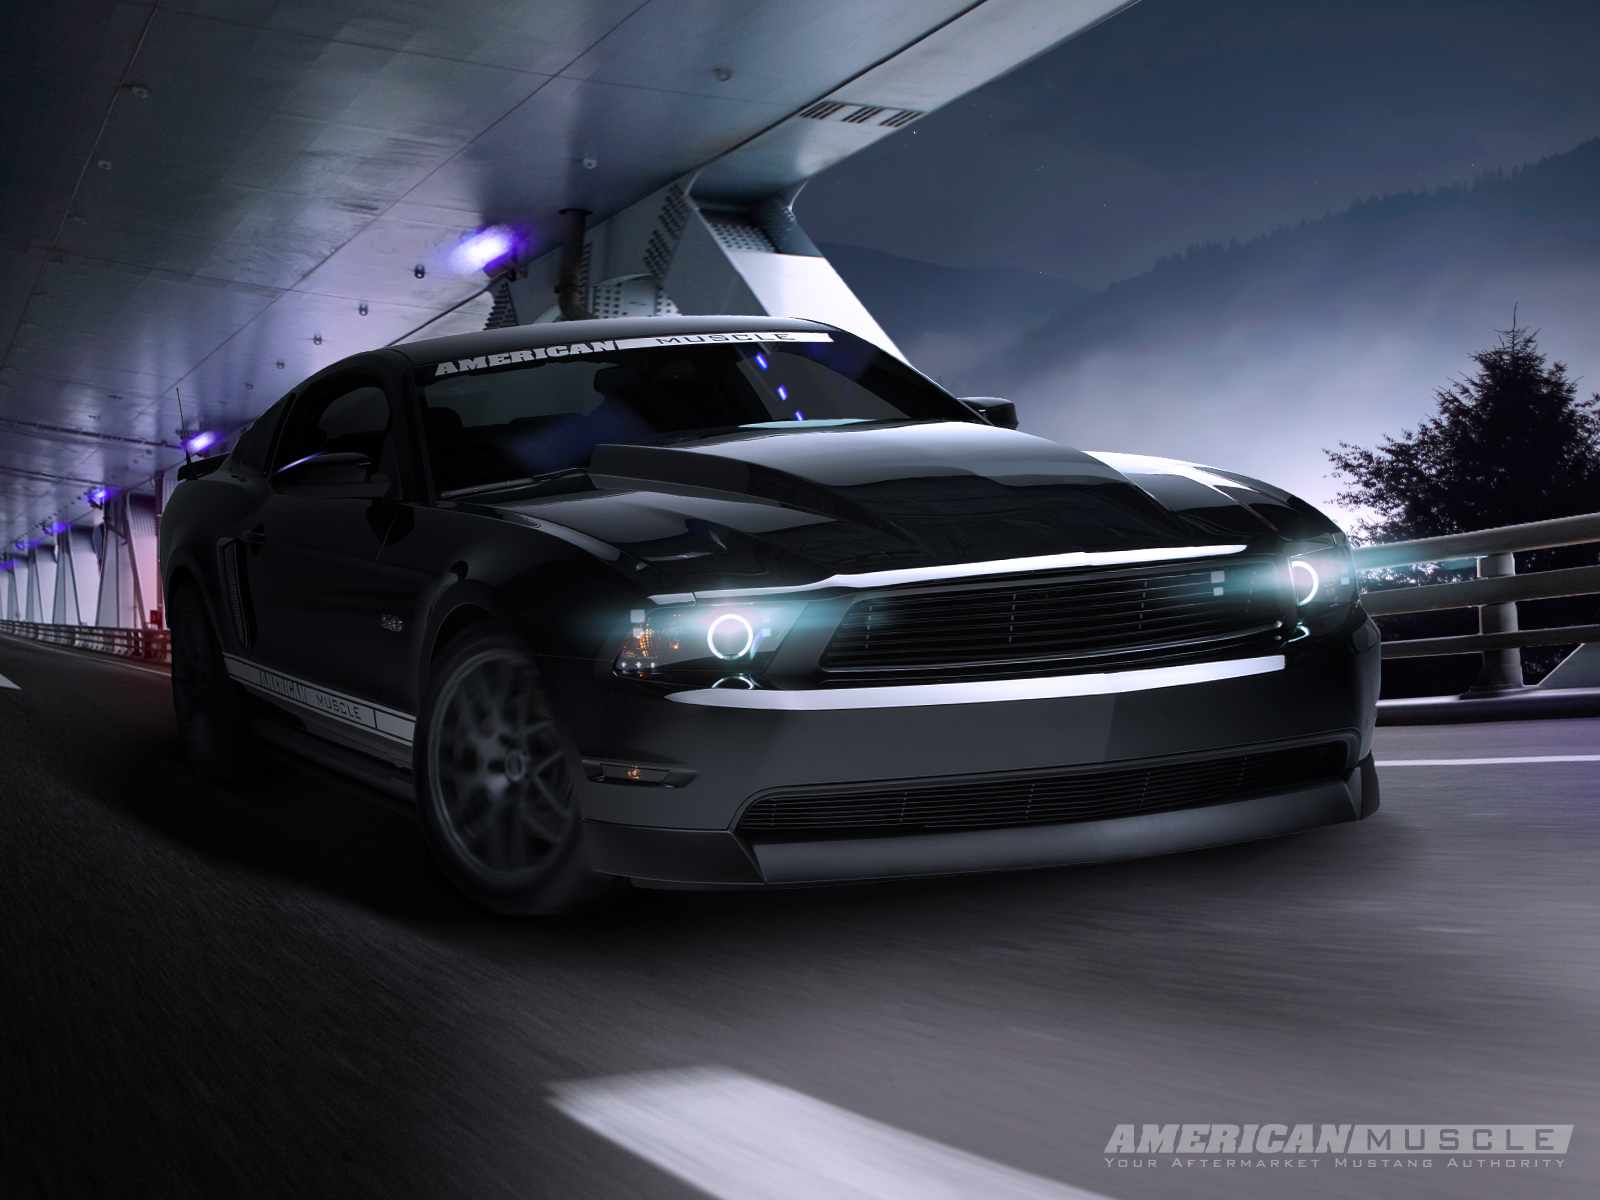 Mustang Night Cruiser Desktop Background Wallpaper Parts for Mustang 1600x1200